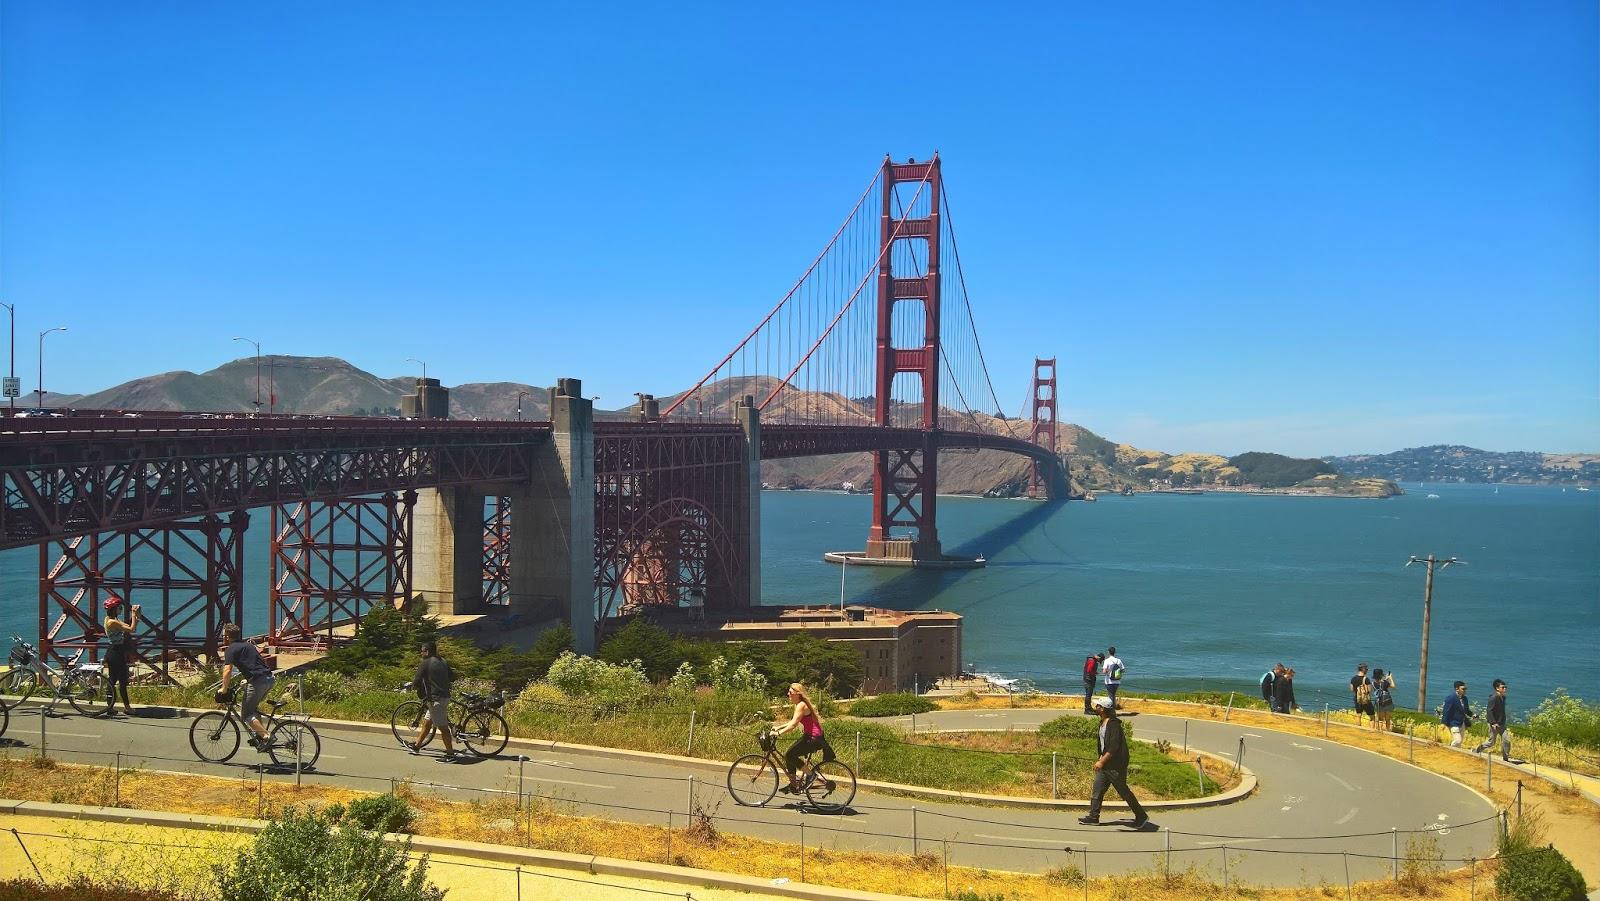 san francisco kalifornia golden gate bridge silta mallaspulla matkailu matkajuttu